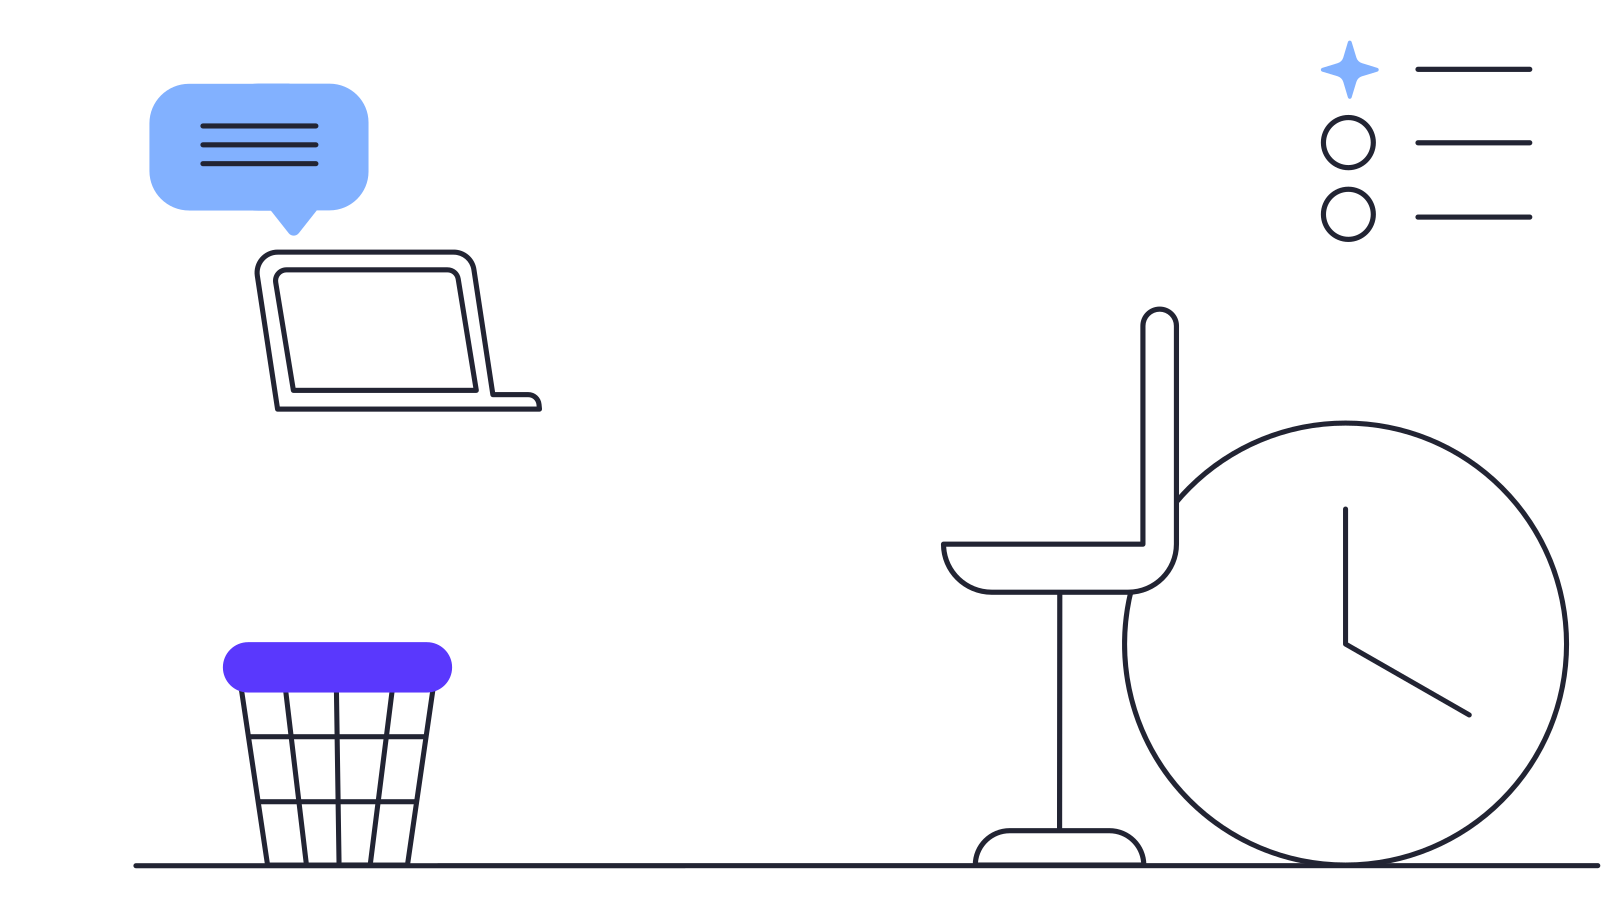 Freelance Clipart illustration in PNG, SVG